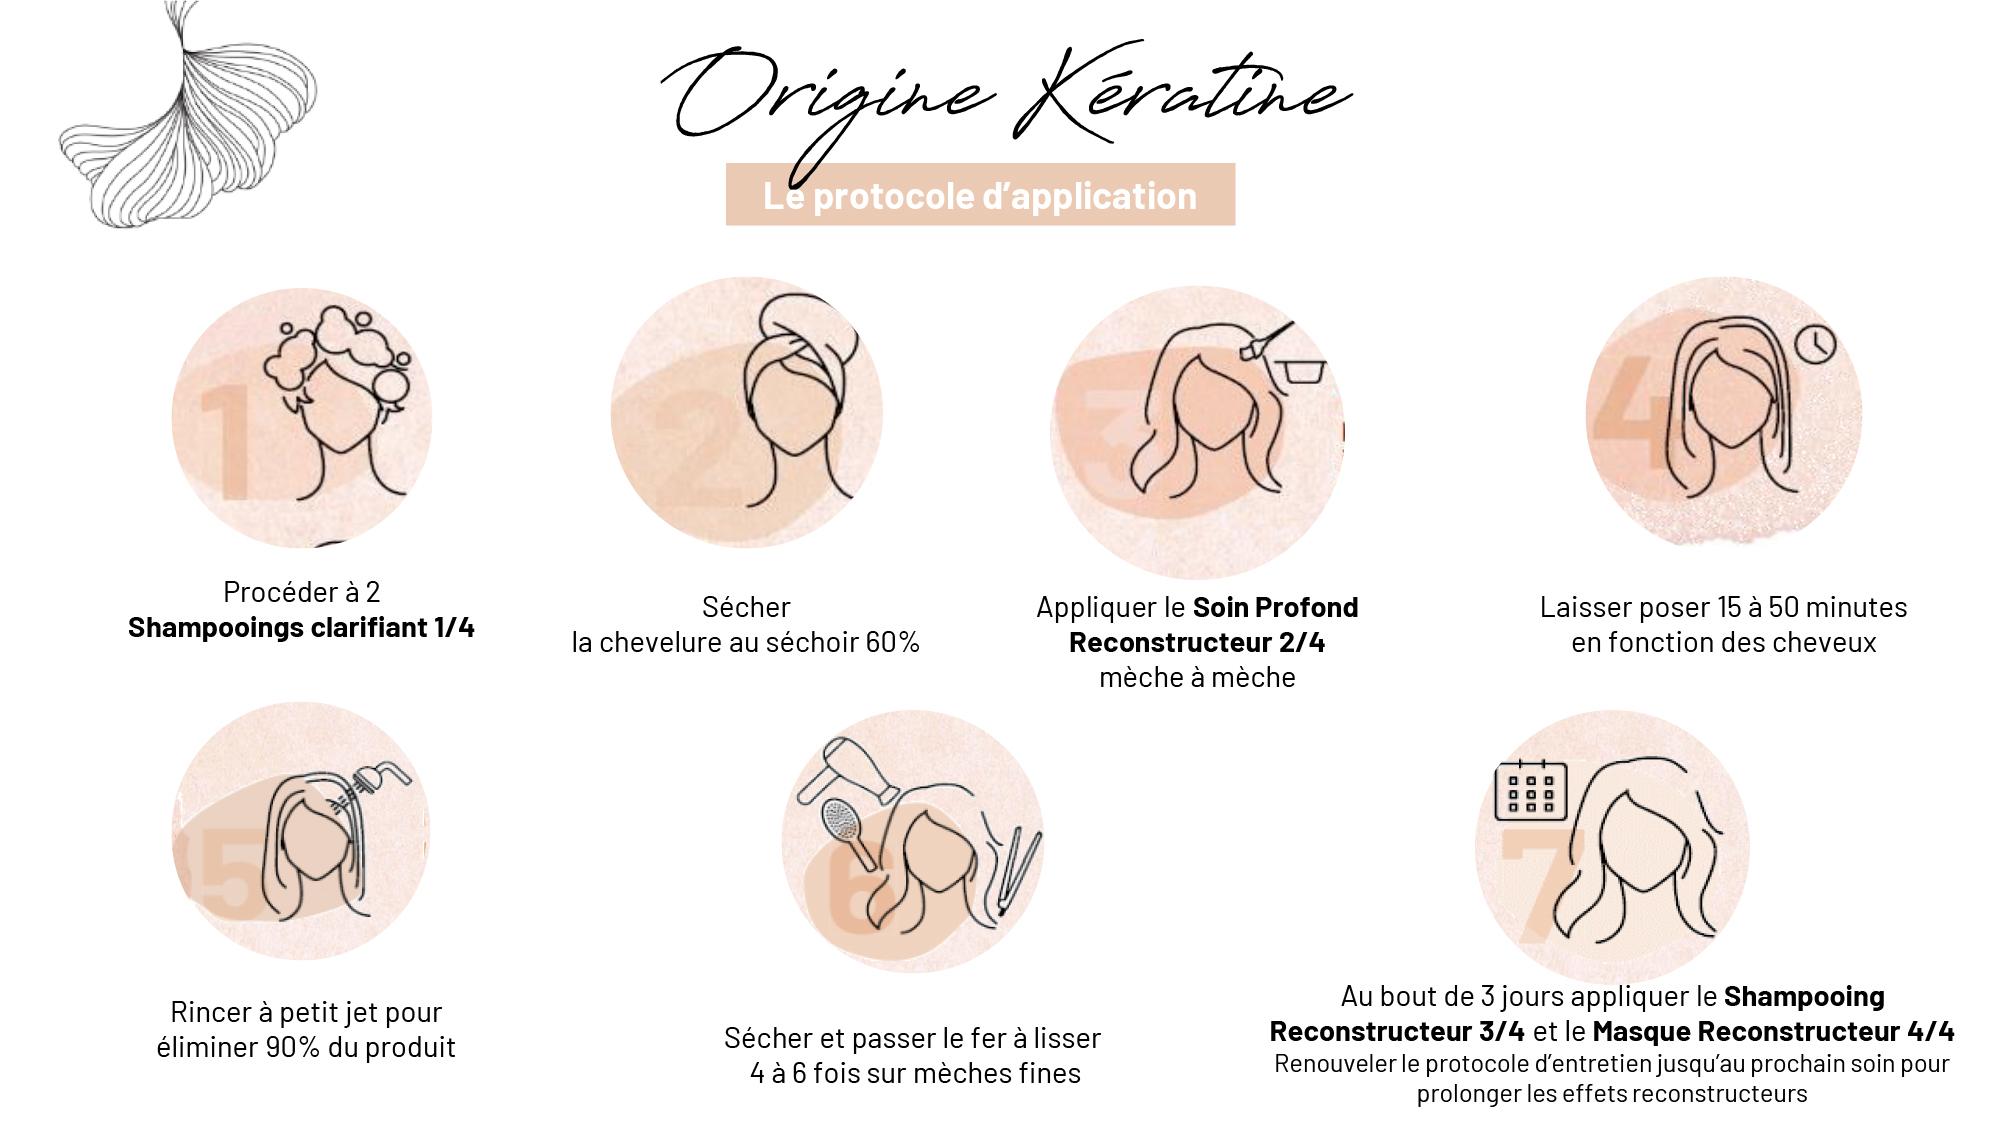 PROTOCOLE APPLICATION ORIGINE KERATINE